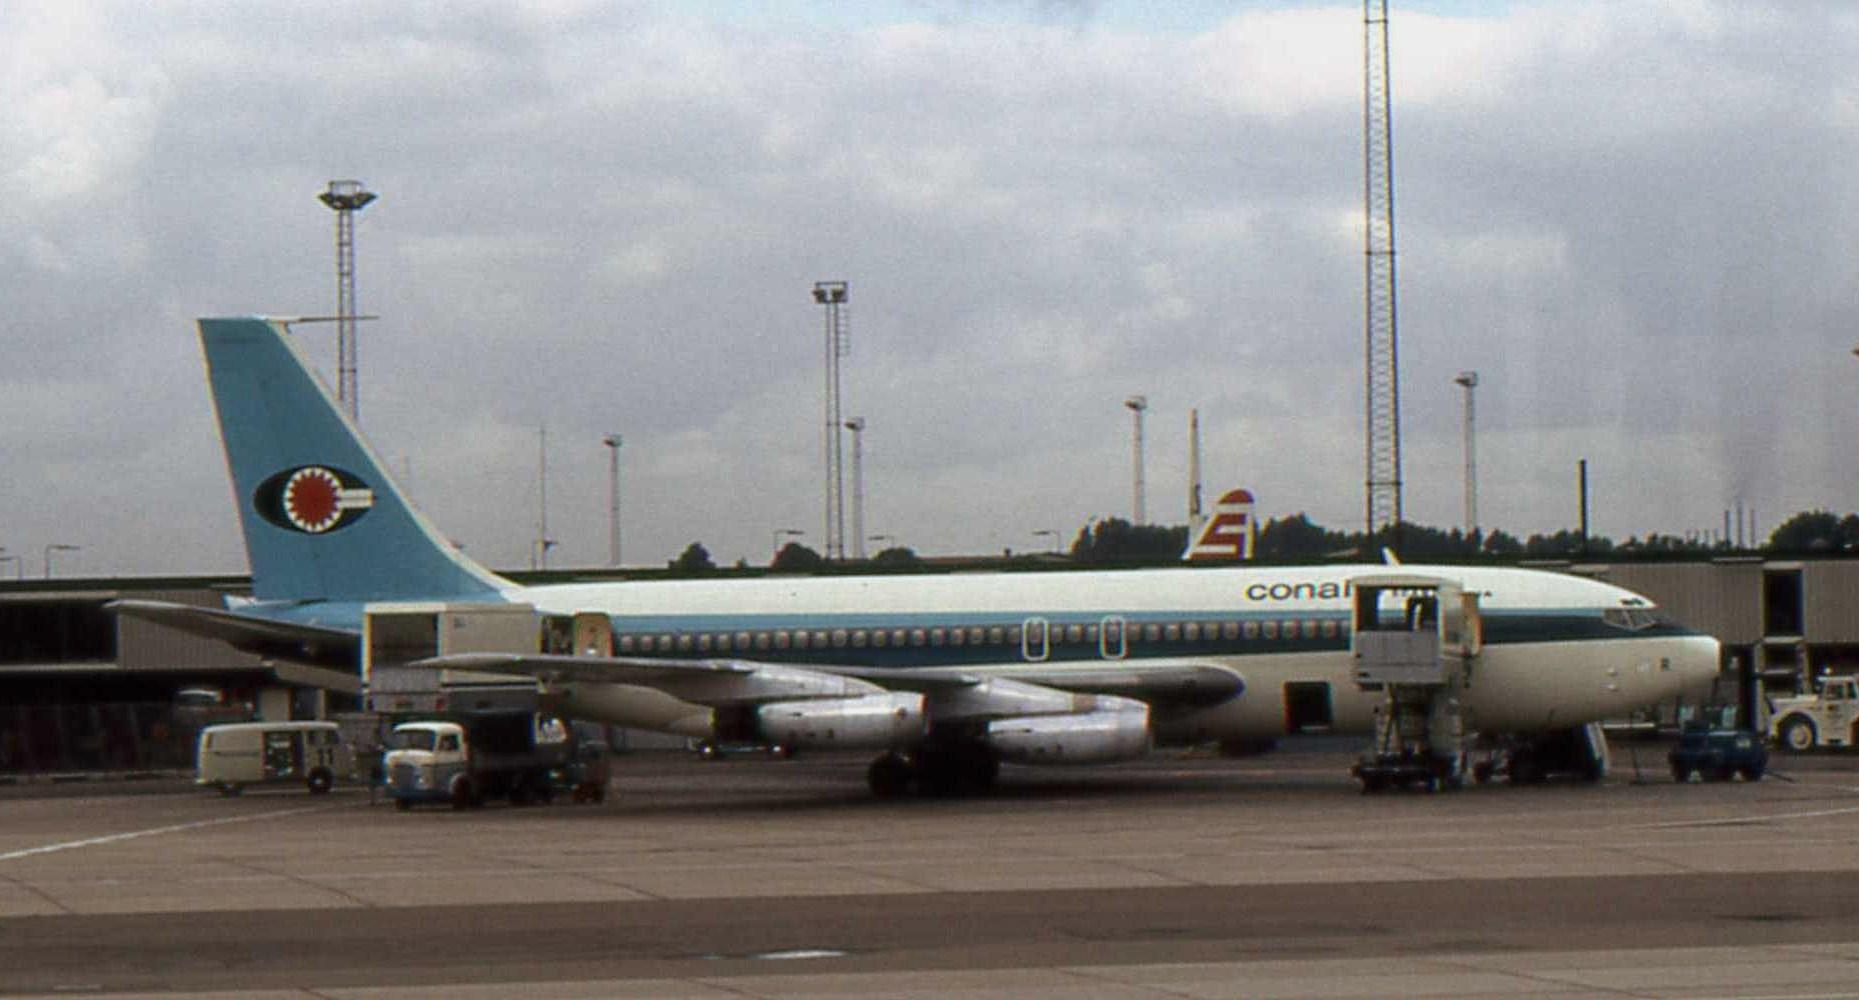 Conairs Boeing 720 med registrering OY-DSL i Københavns Lufthavn i august 1972. Foto: Piergiuliano Chesi, CC 3.0